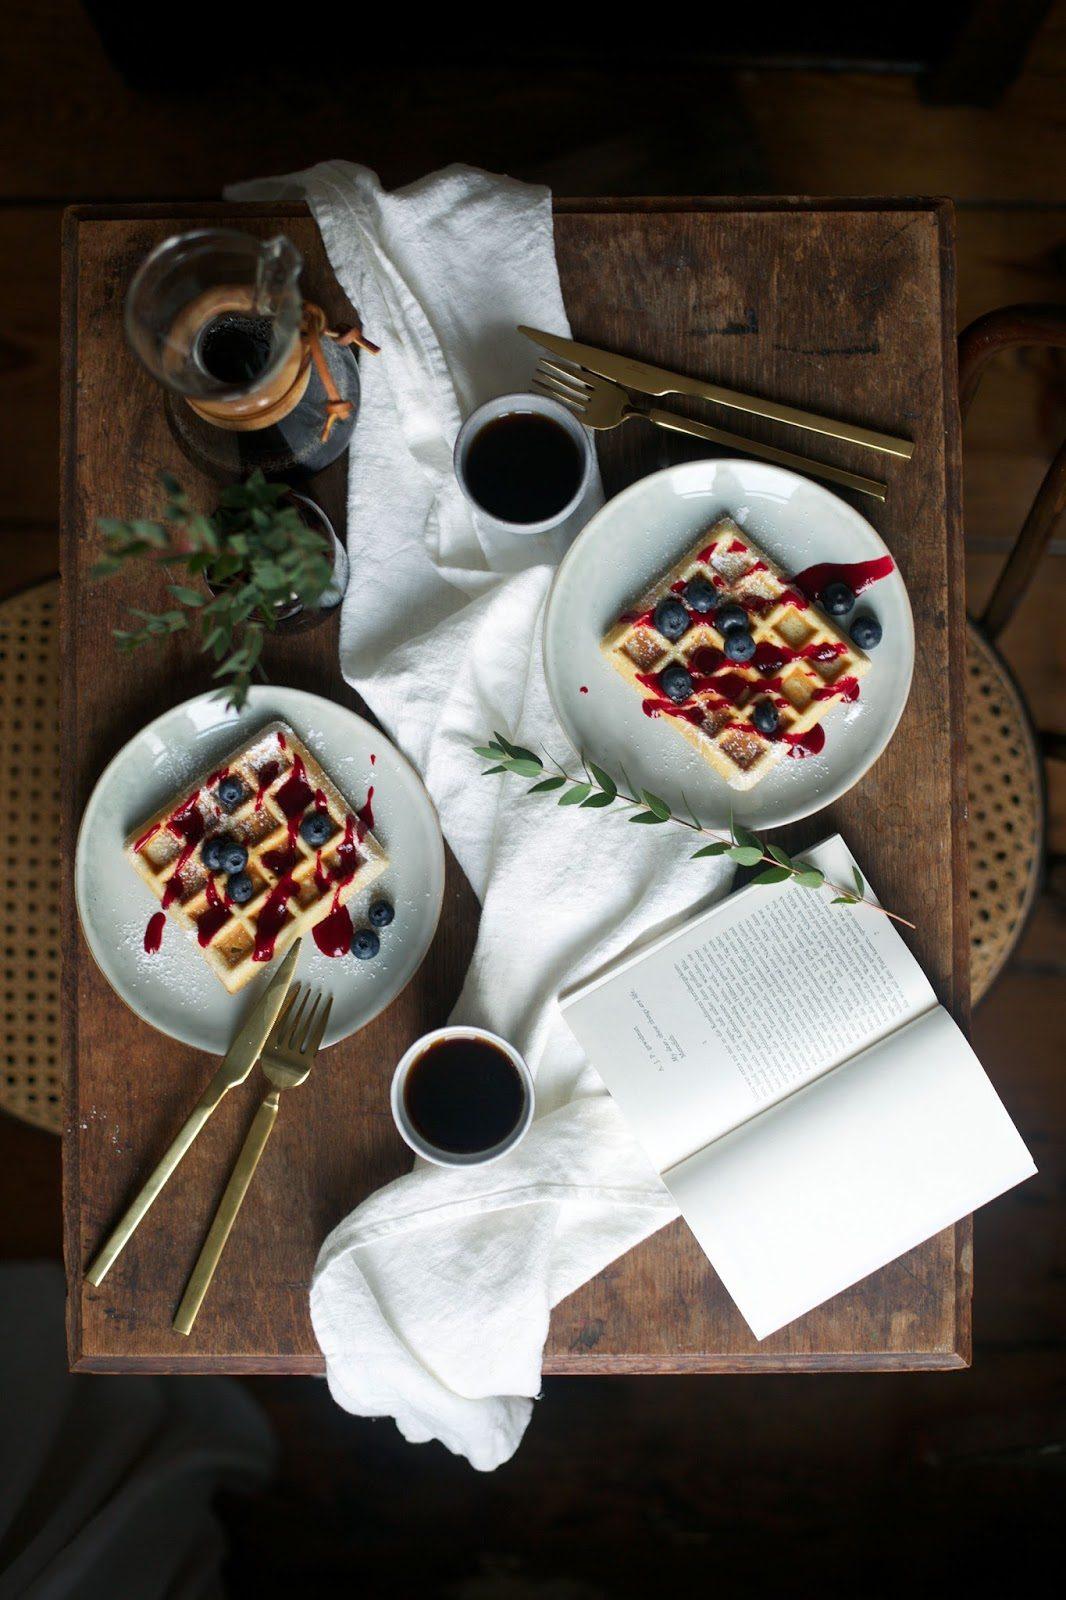 Gluten-free Ginger & Cardamom Waffles